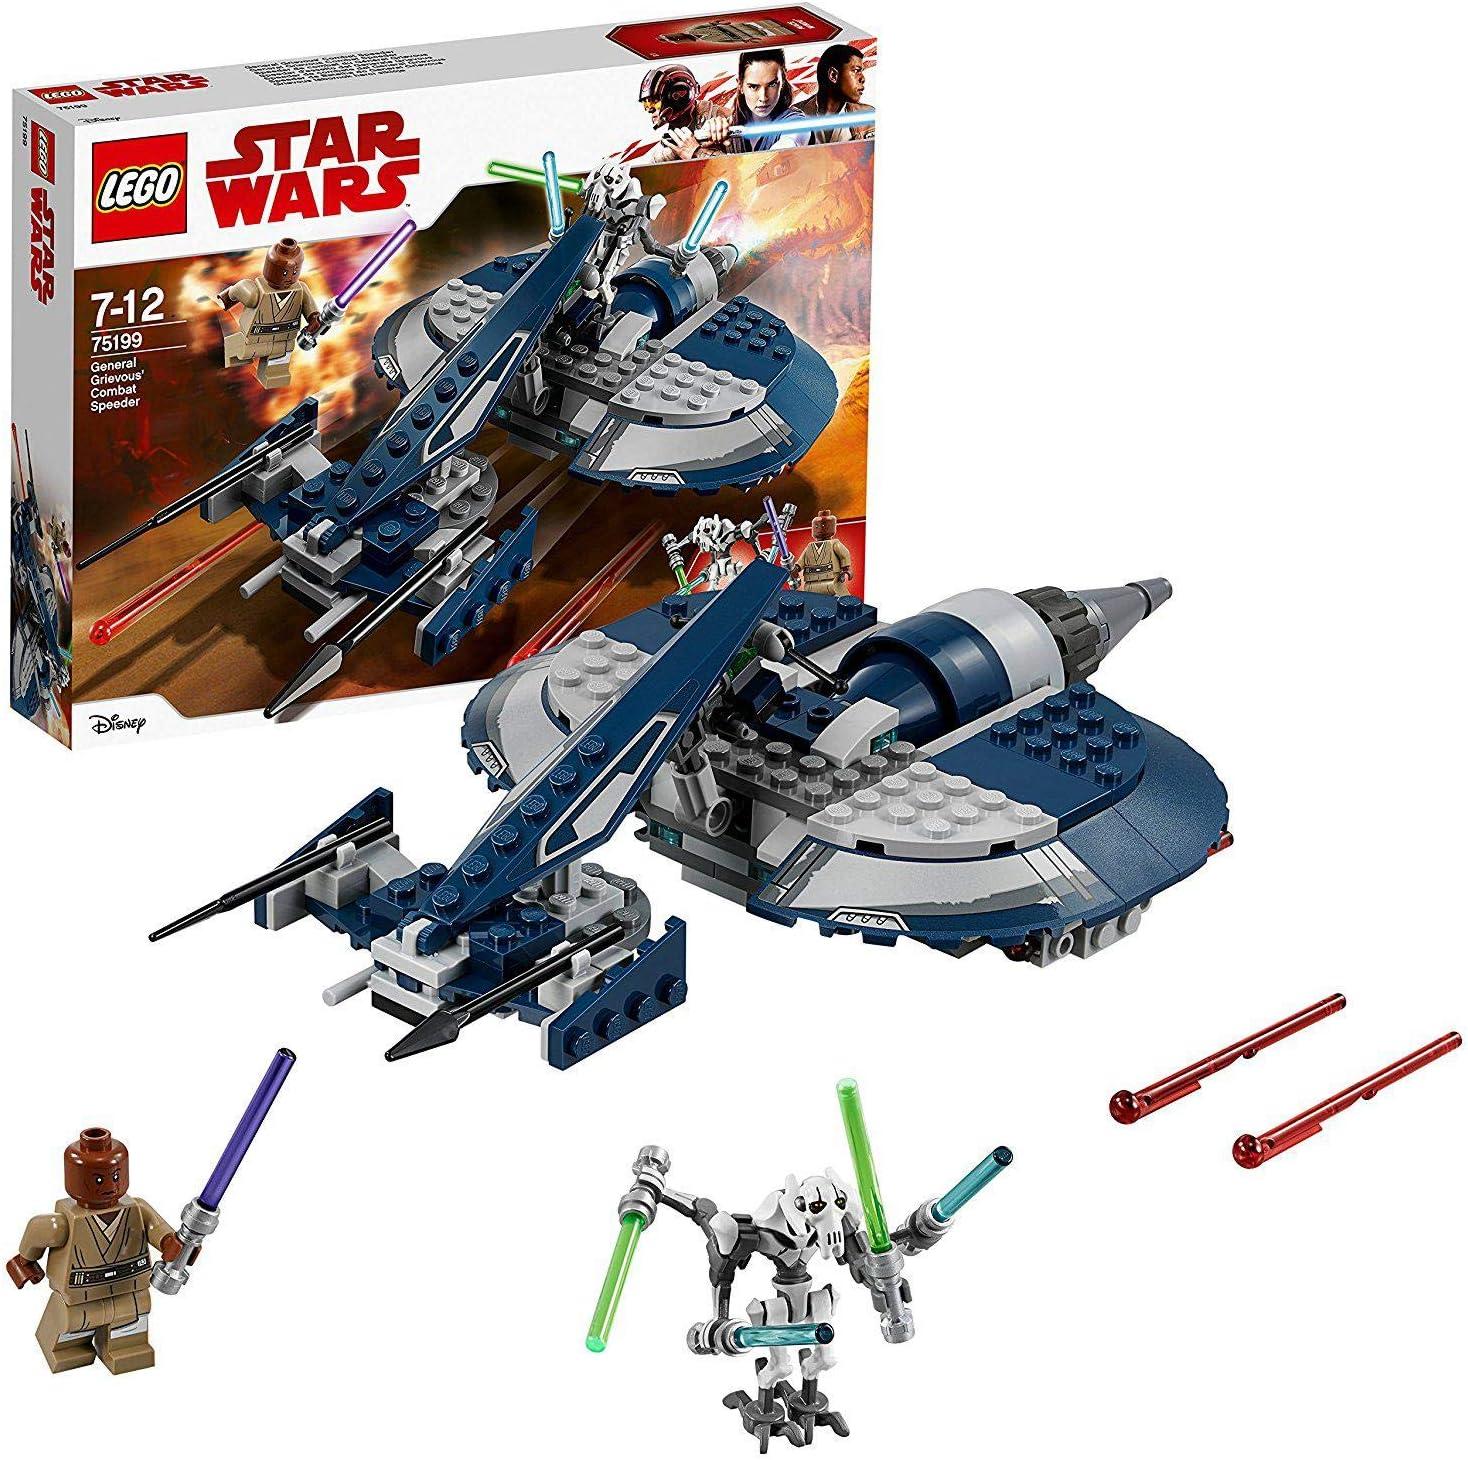 LEGO Star Wars- General Grievous Combat Speeder TM Star Wars Juego ...